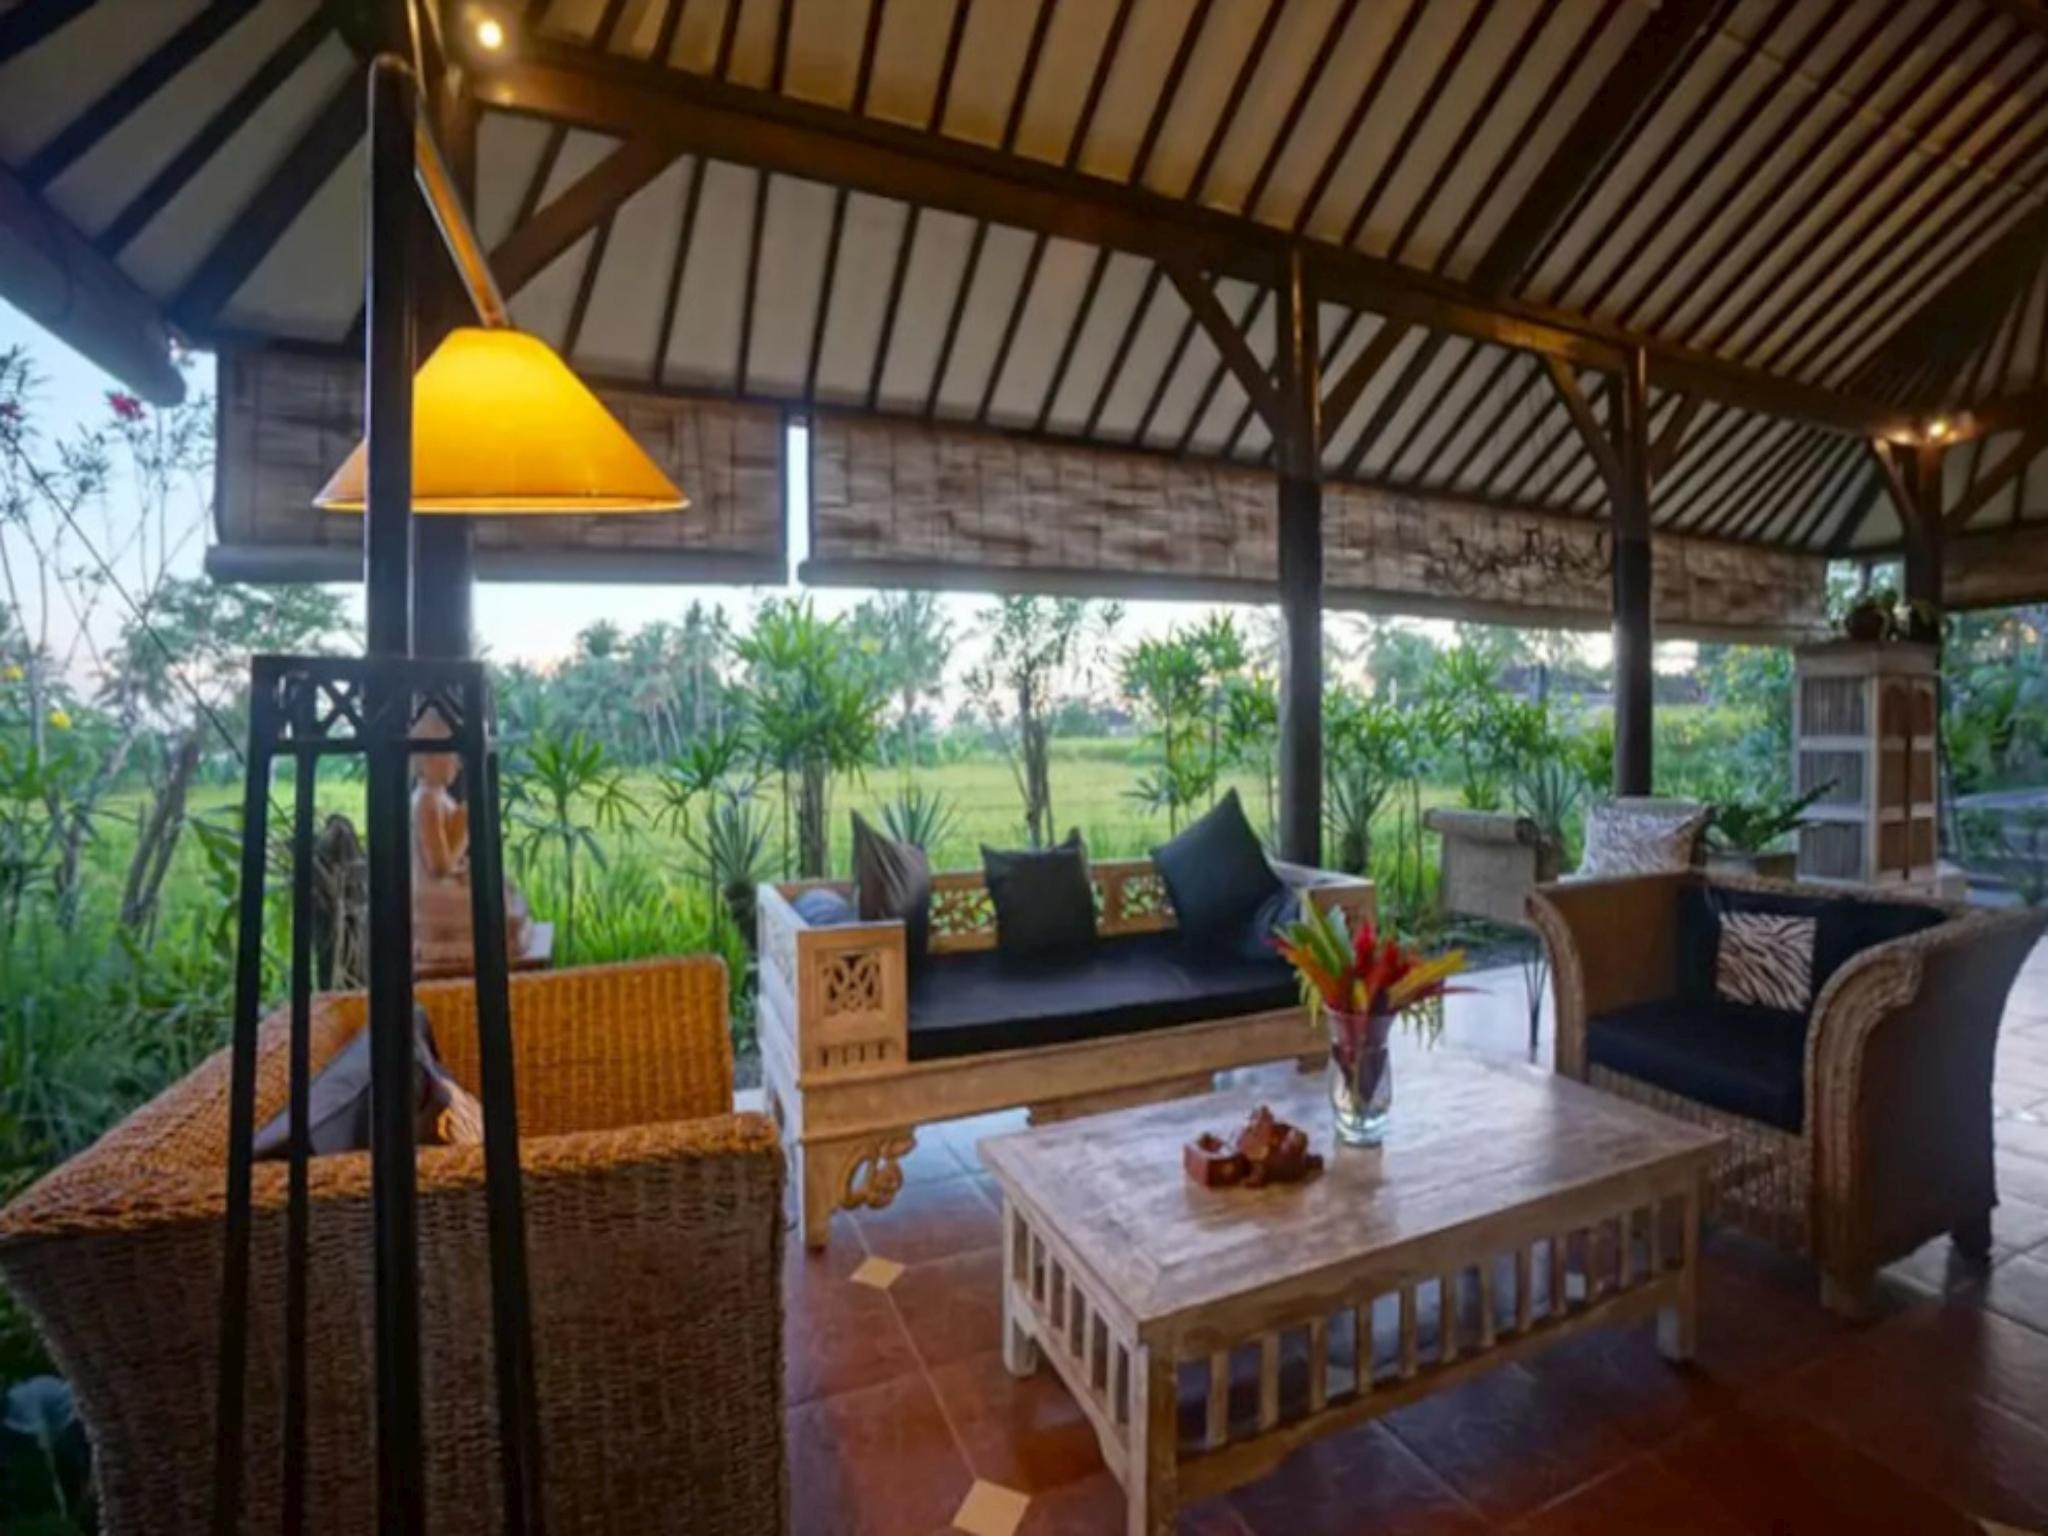 4BR Classy & Healthy Family Villa in Ubud